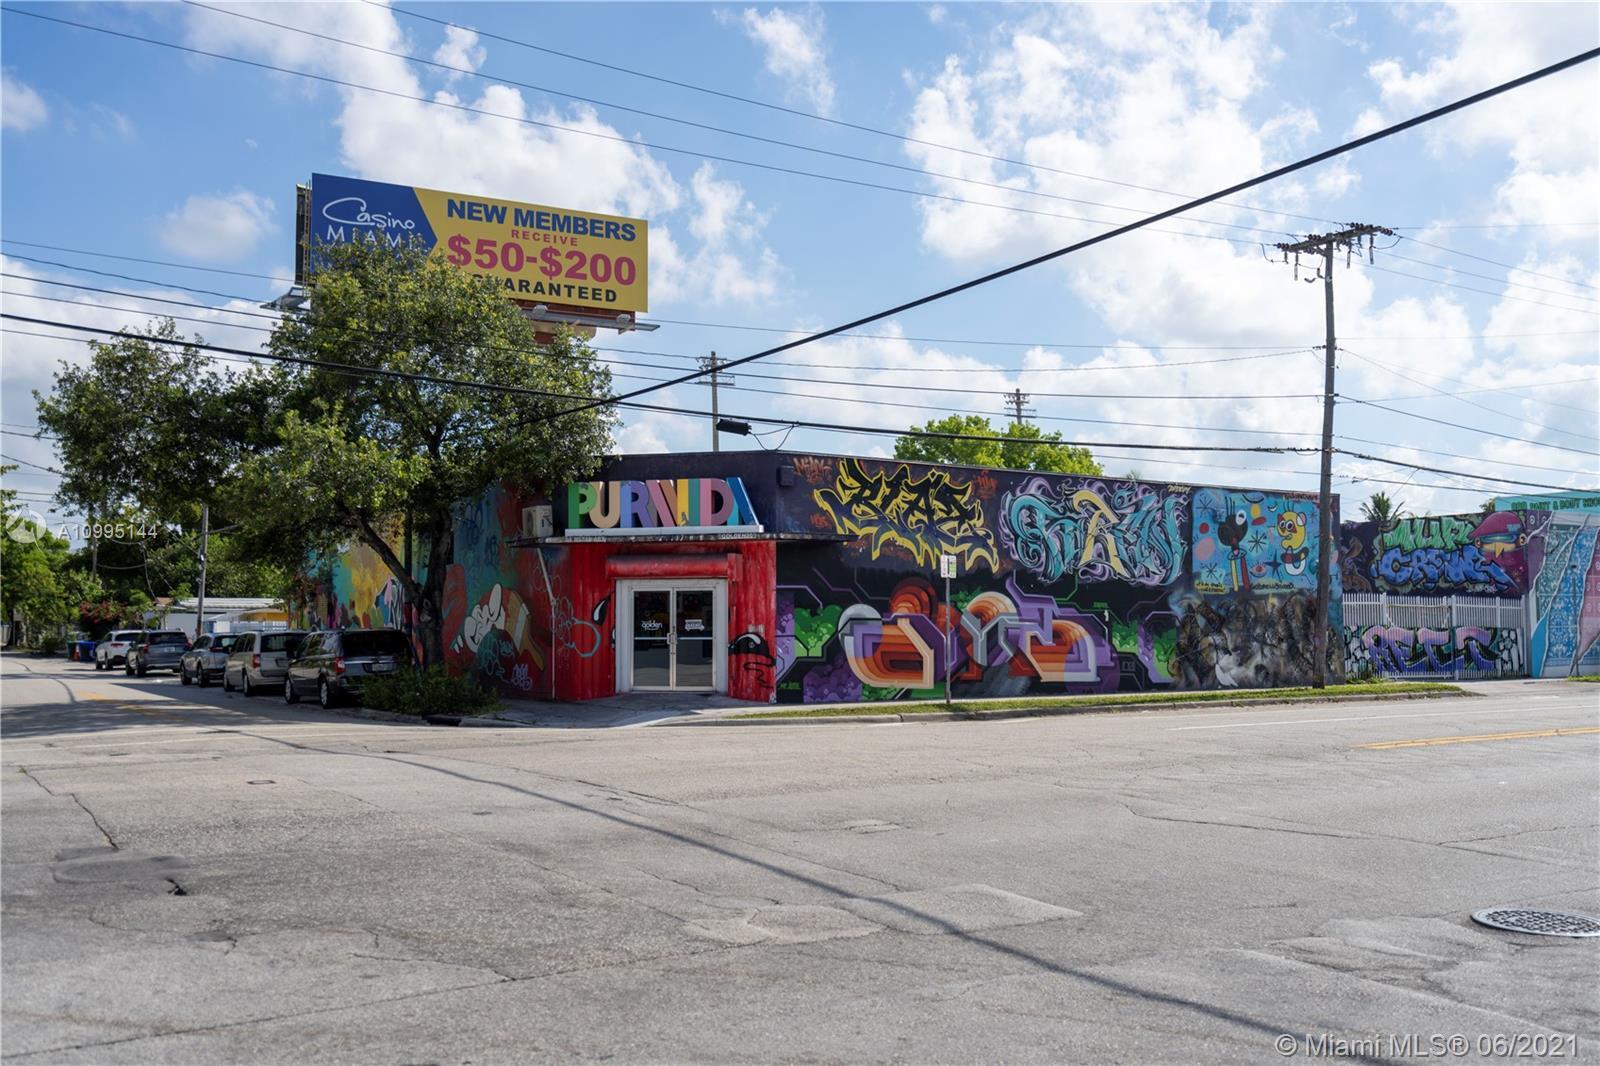 591 29th St, Miami, Florida 33127